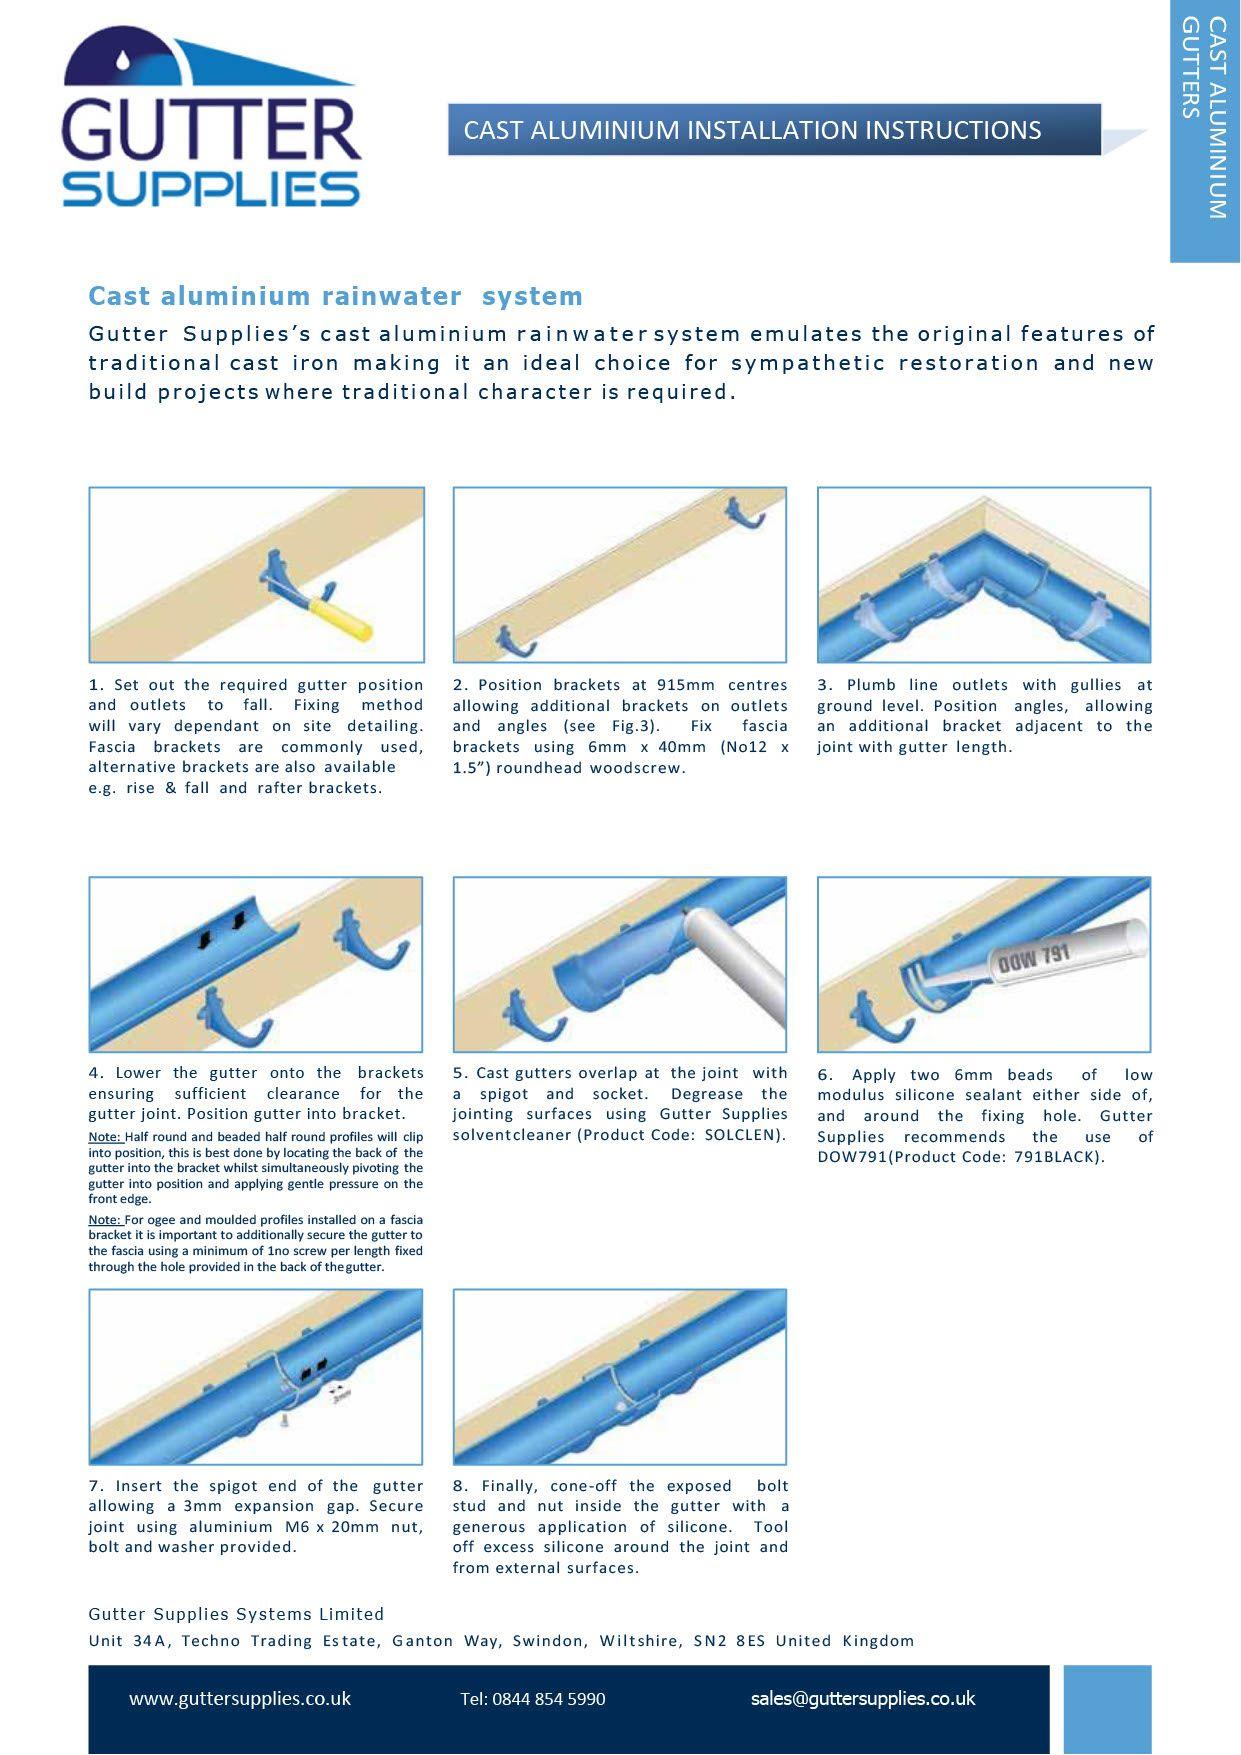 Aluminium Gutter Installation Instructions How To Install Gutters Gutter Installation